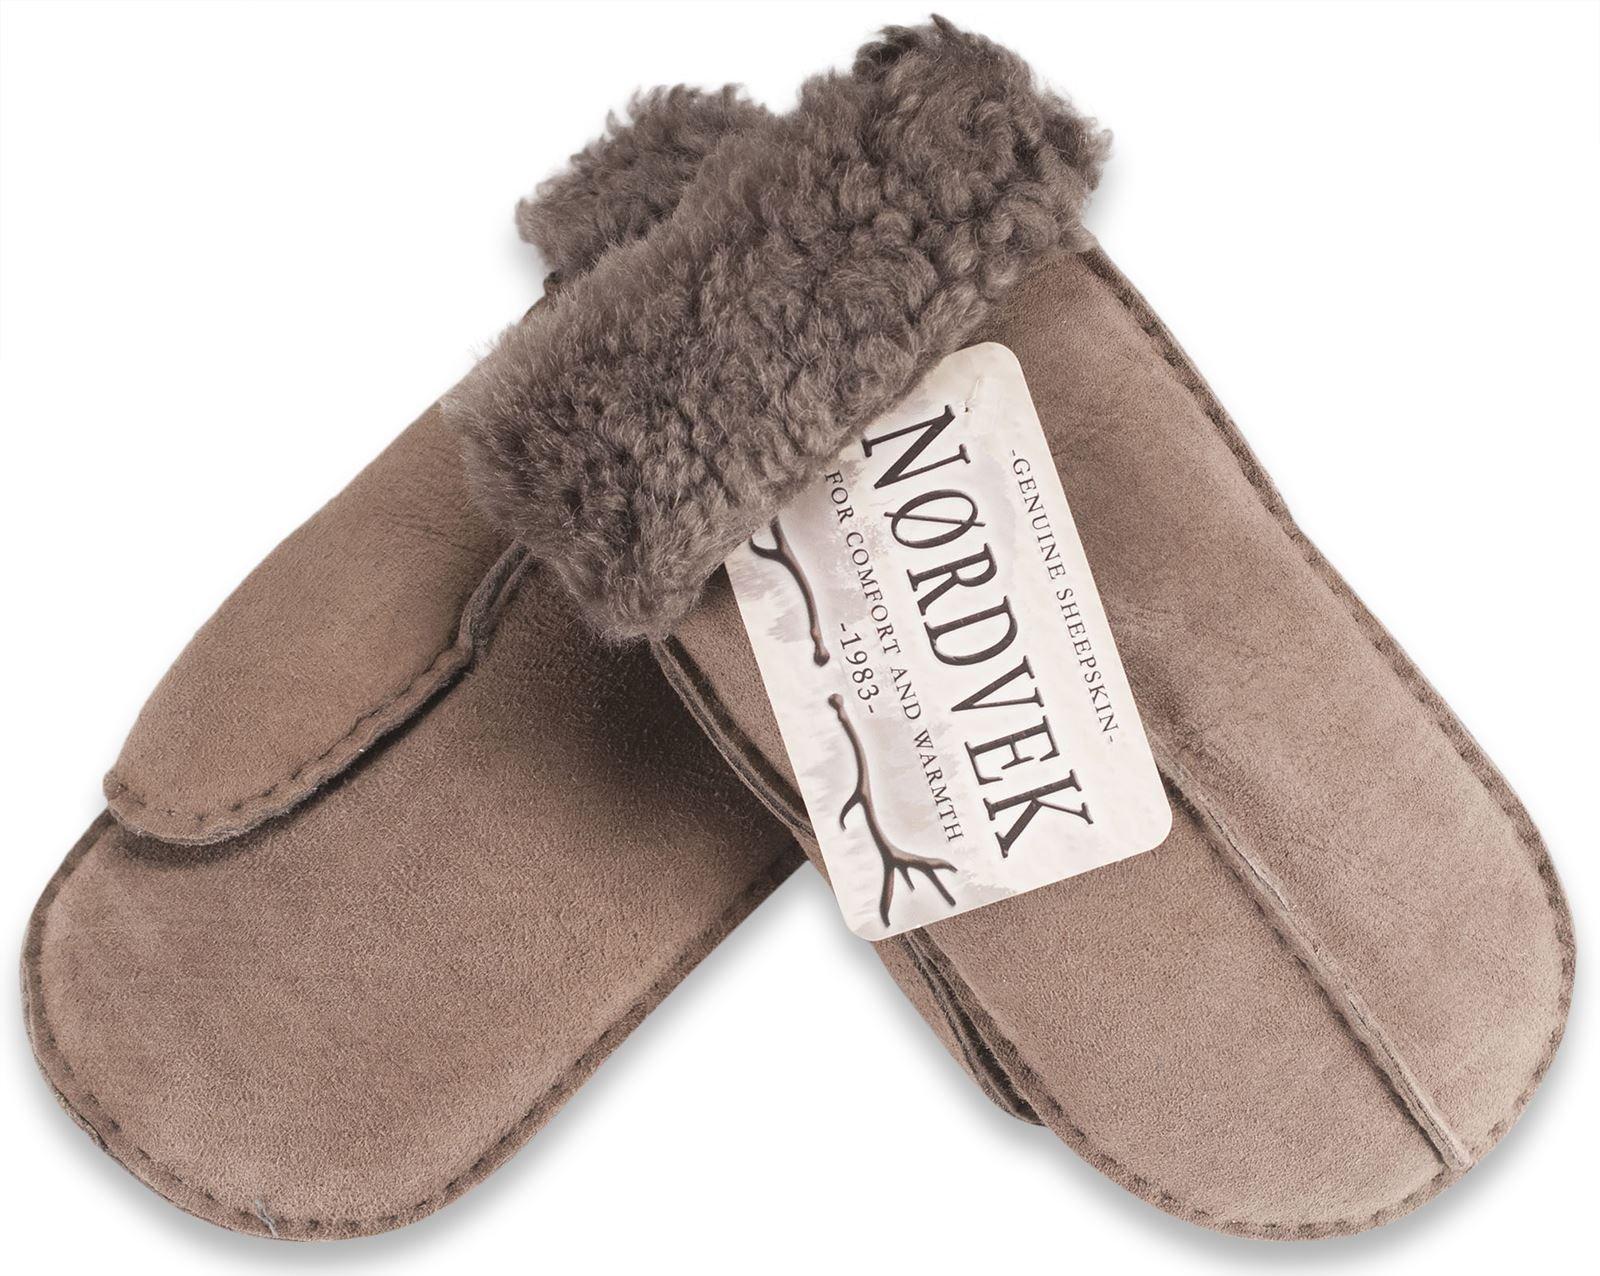 Nordvek Women's Sheepskin Mittens # 315-100 (One Size, Stone)